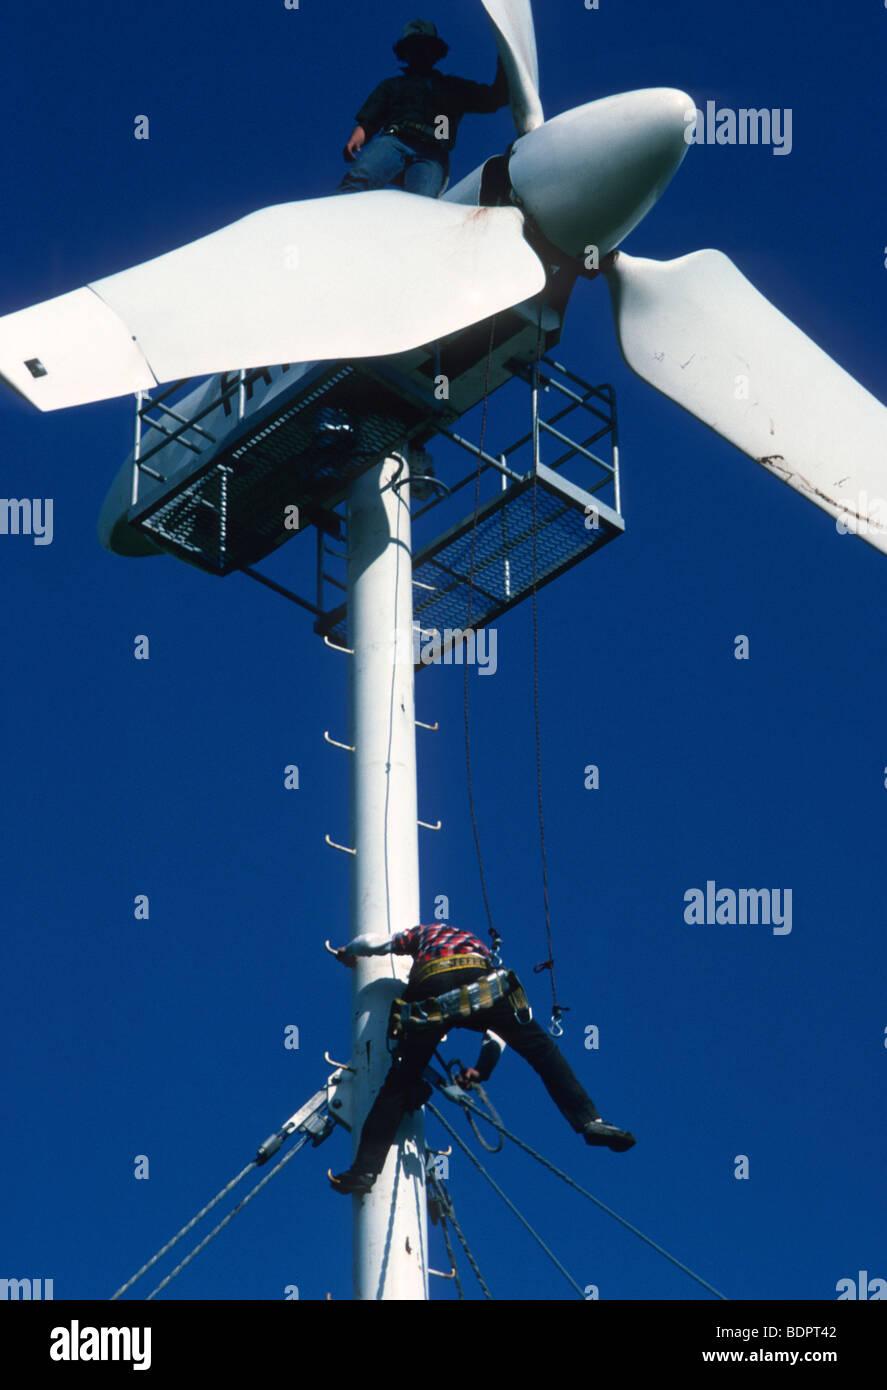 Windmills at Altamont Pass - Stock Image